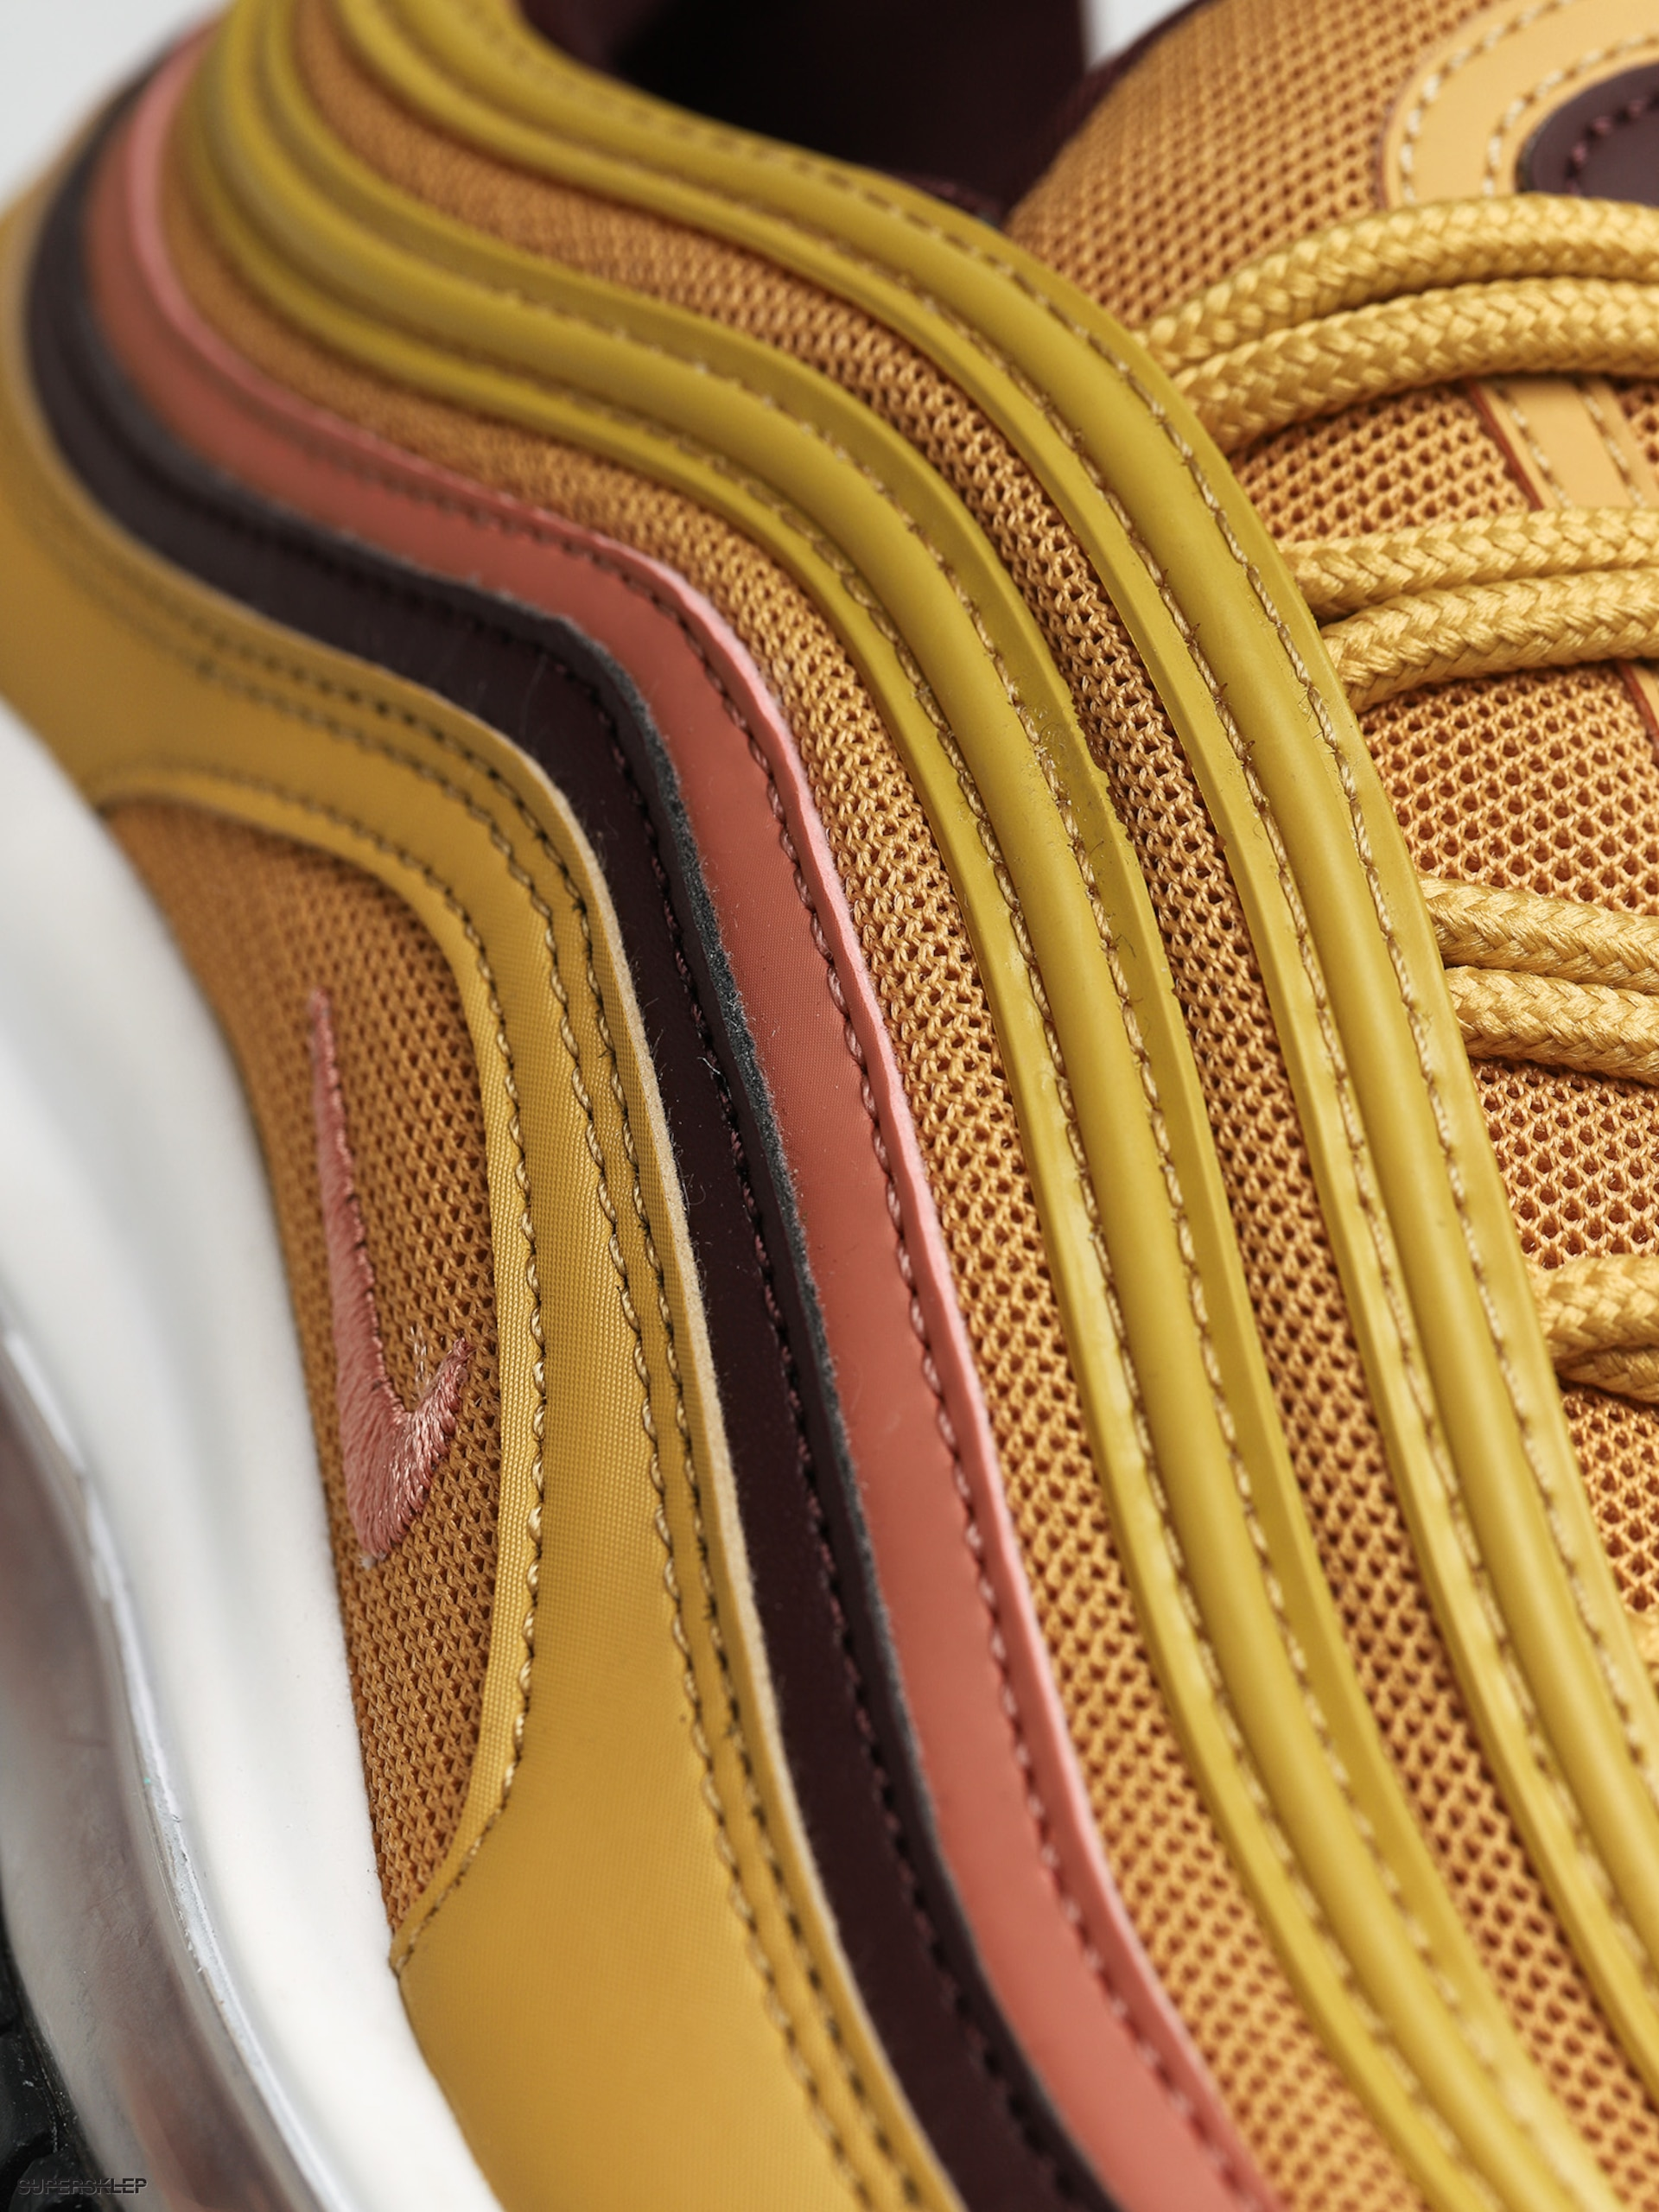 Buty Nike Air Max 97 Wmn (wheat goldterra blush burgundy crush)